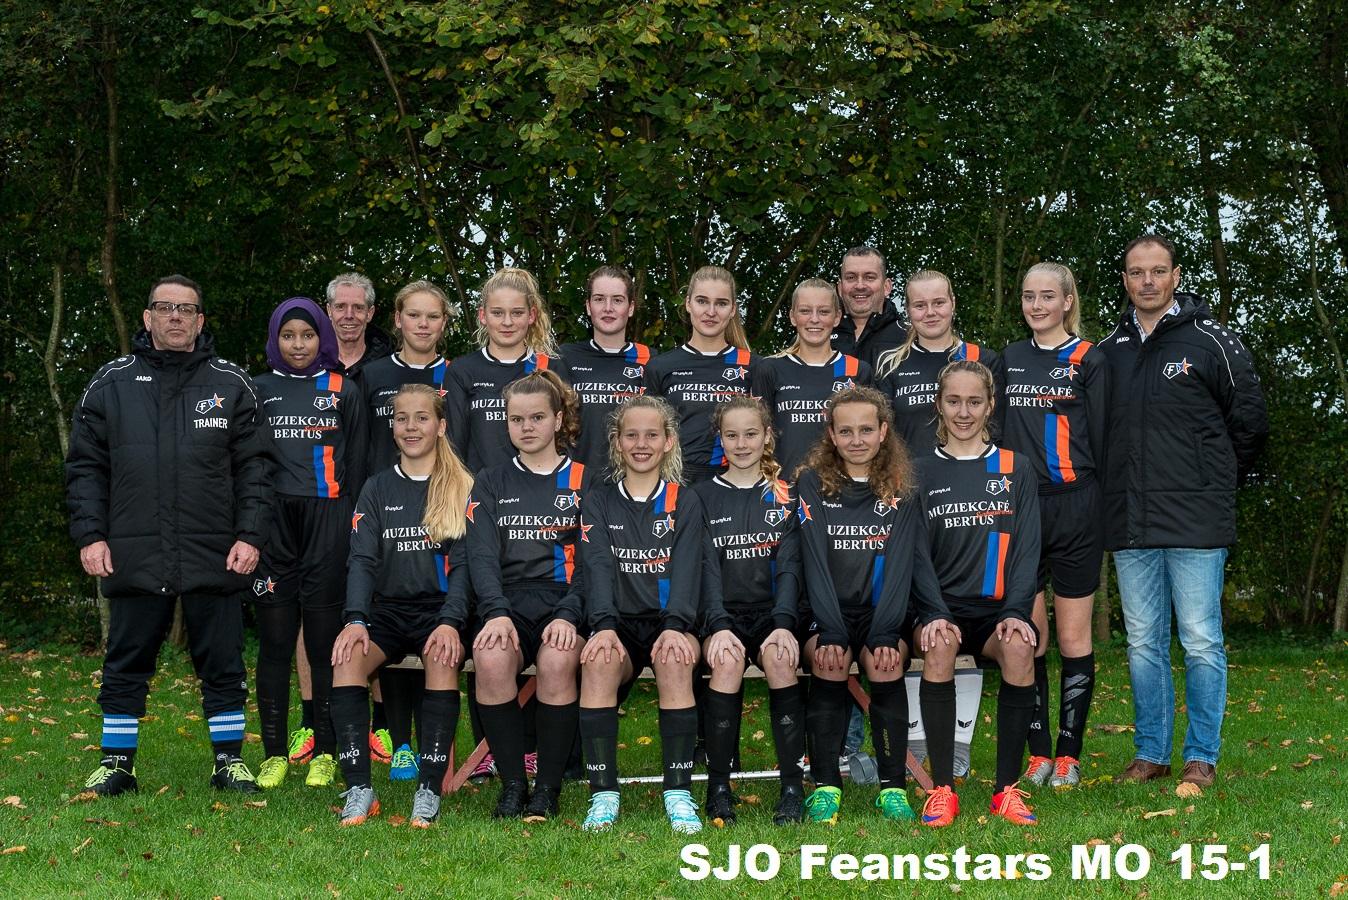 SJO Feanstars MO 15-1